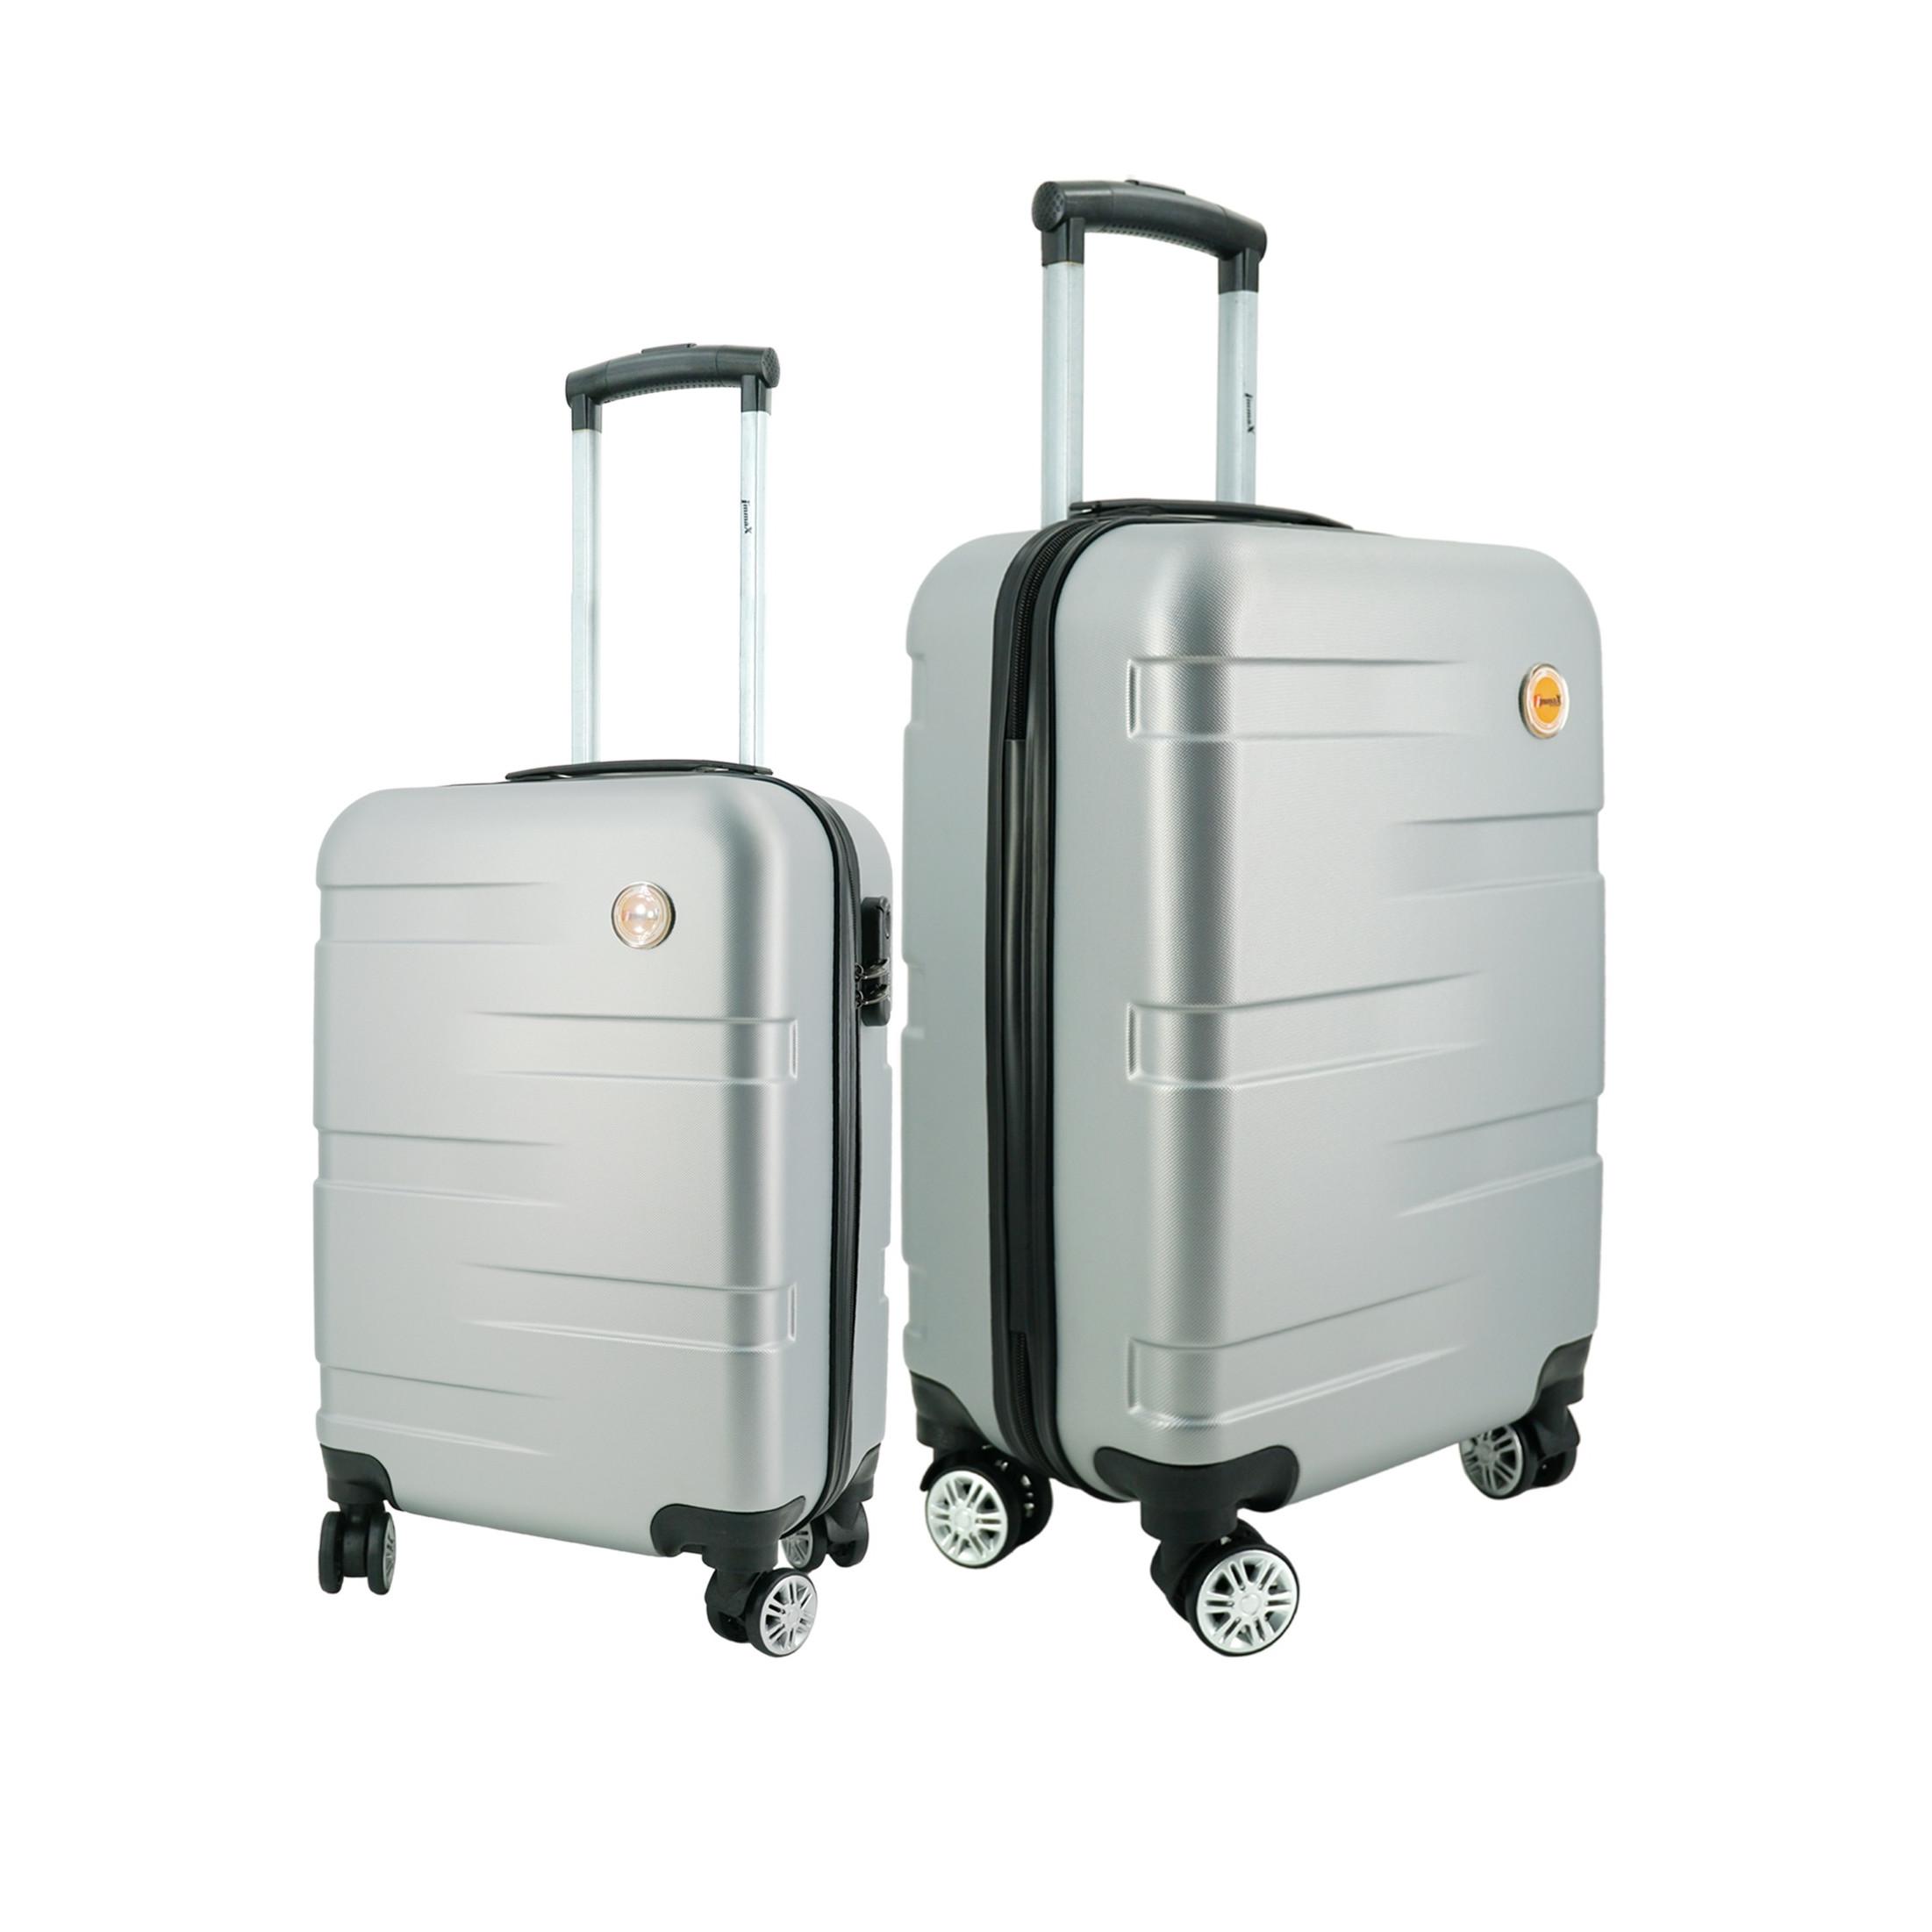 Bộ 2 vali nhựa du lịch size 20inch + 24icnh i'mmaX X14